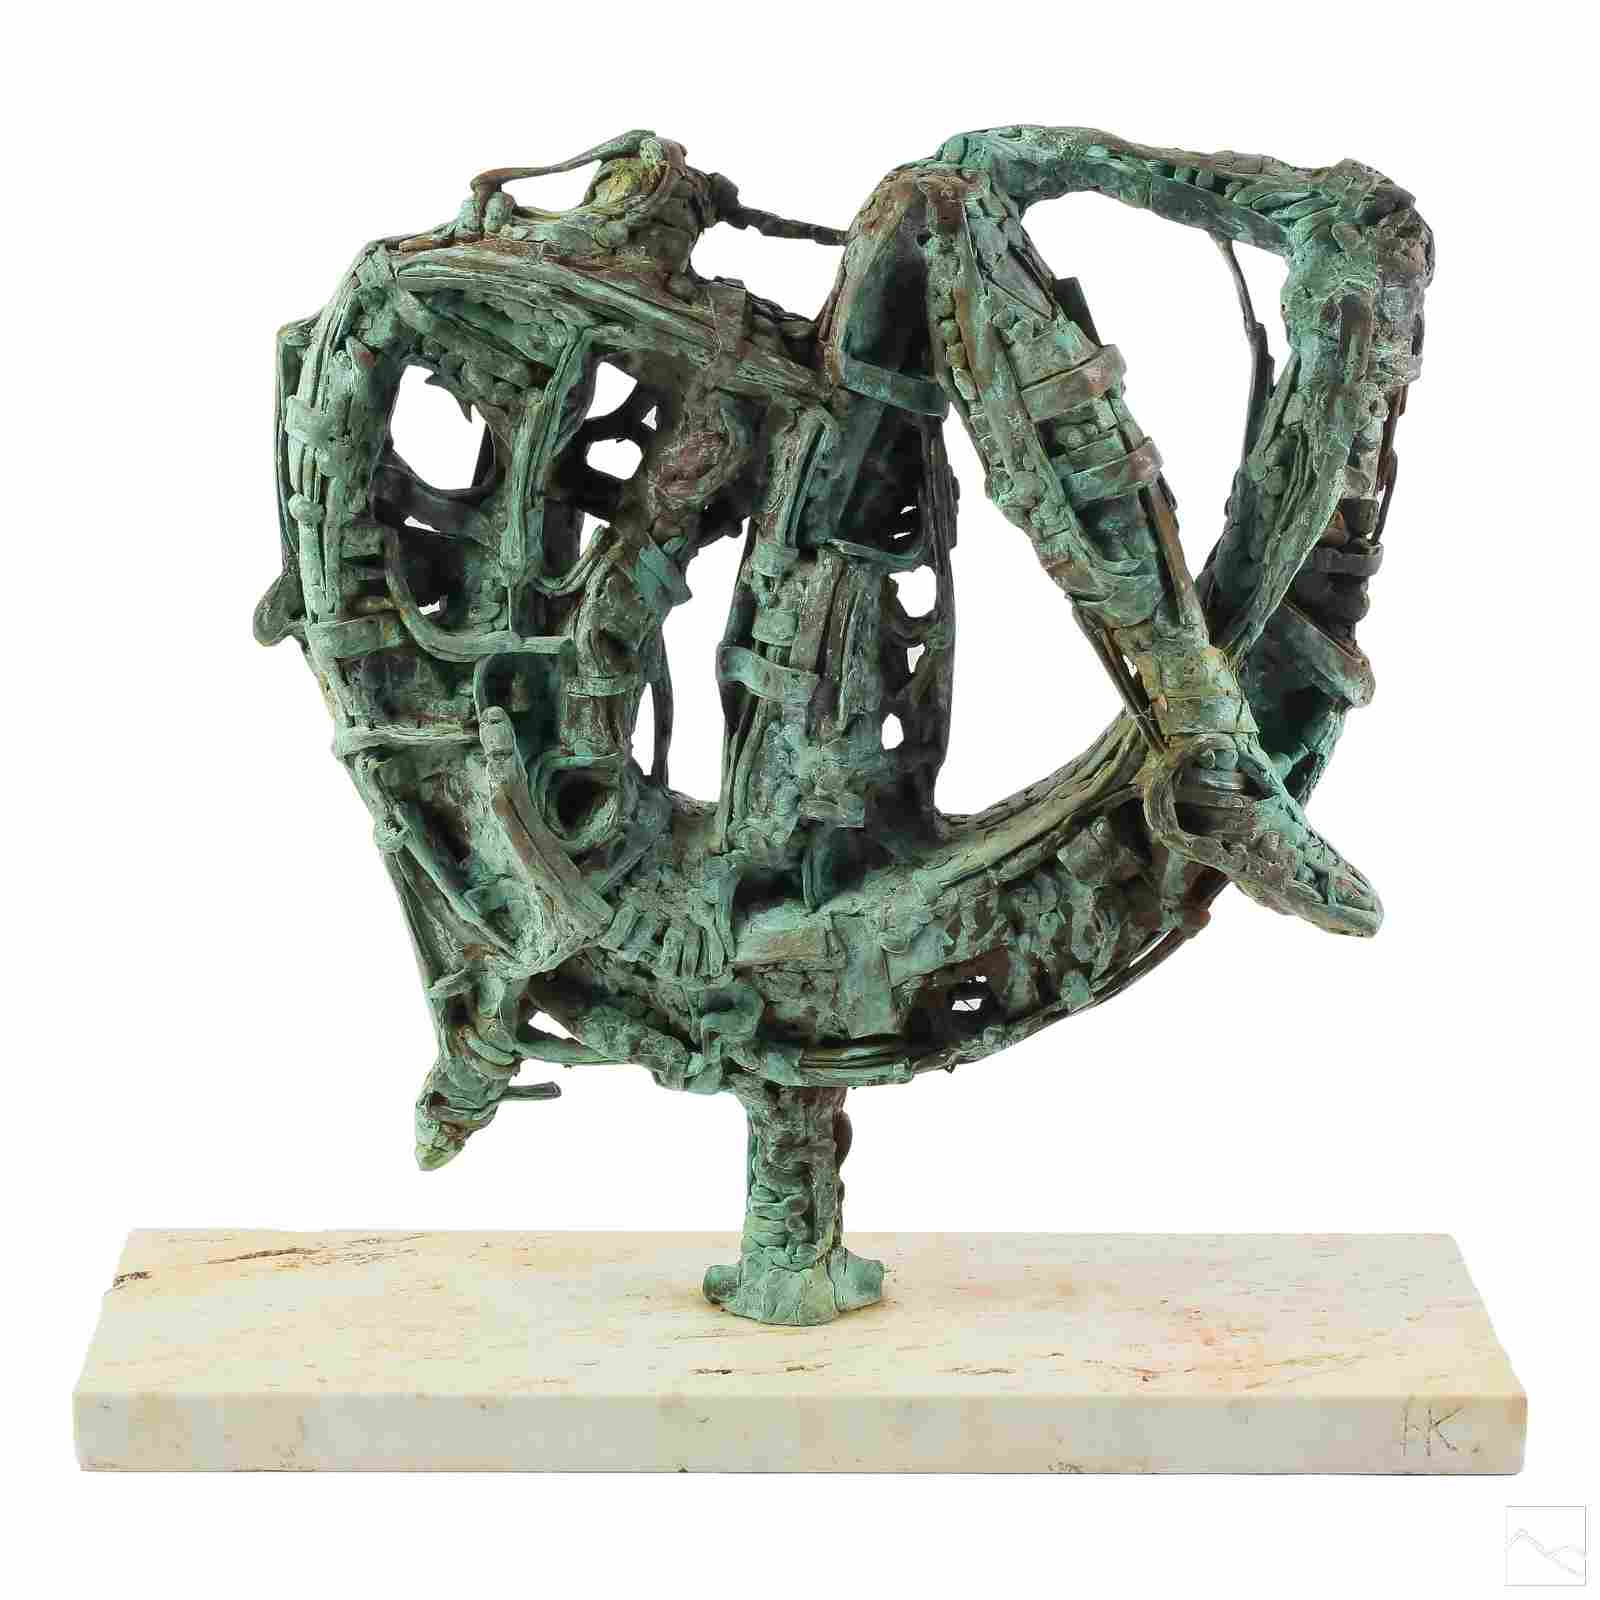 Naum Knop 1917-1993 Abstract Bronze Sculpture